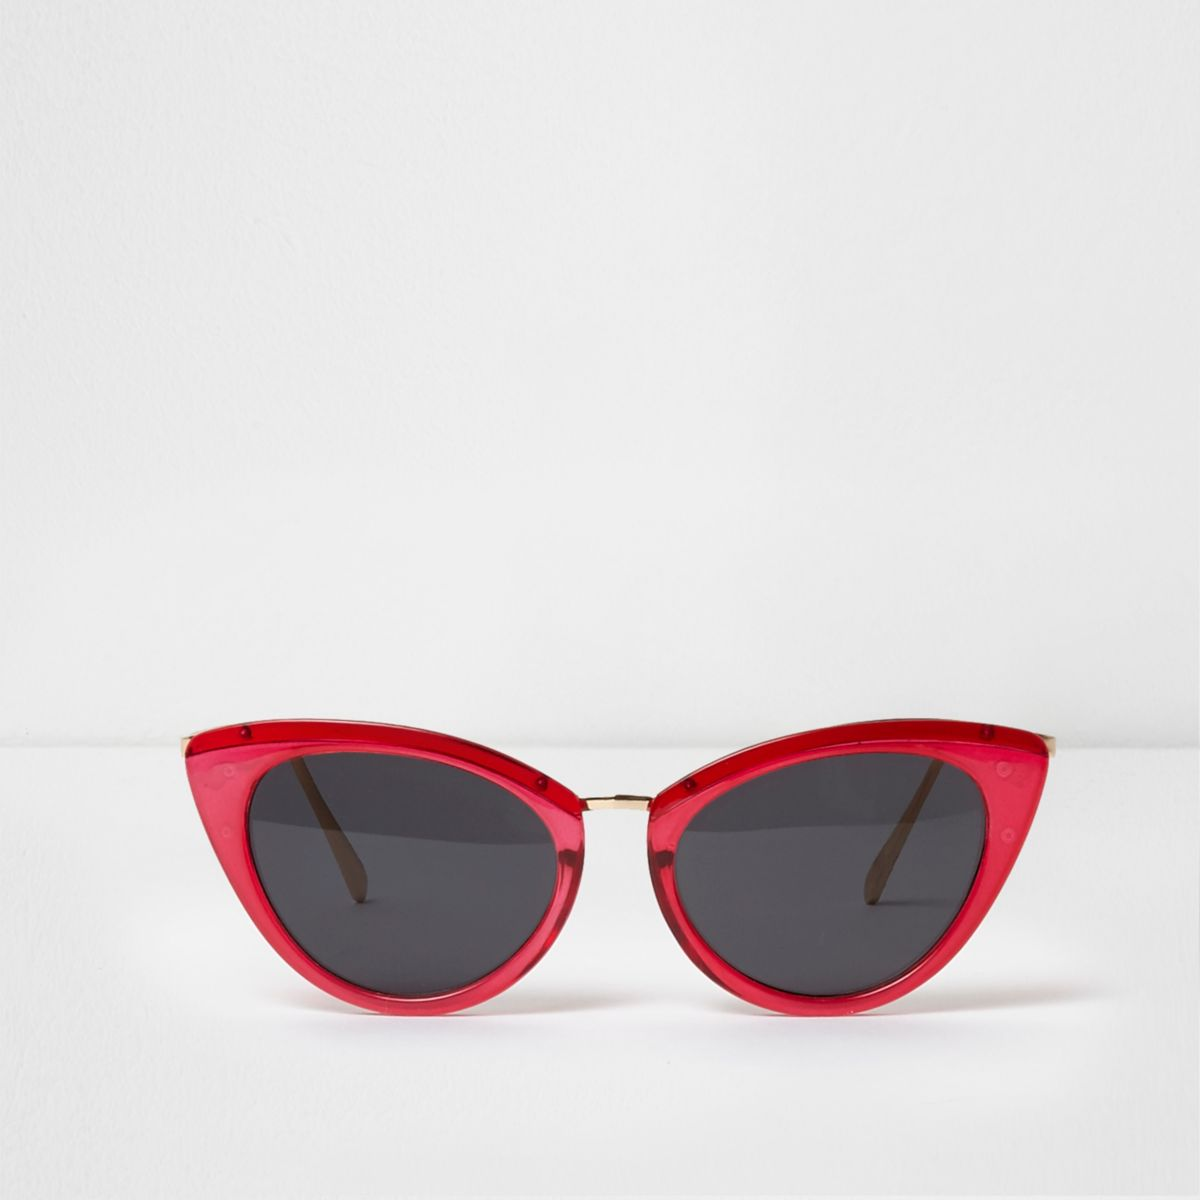 Bright pink cat eye smoke lens sunglasses